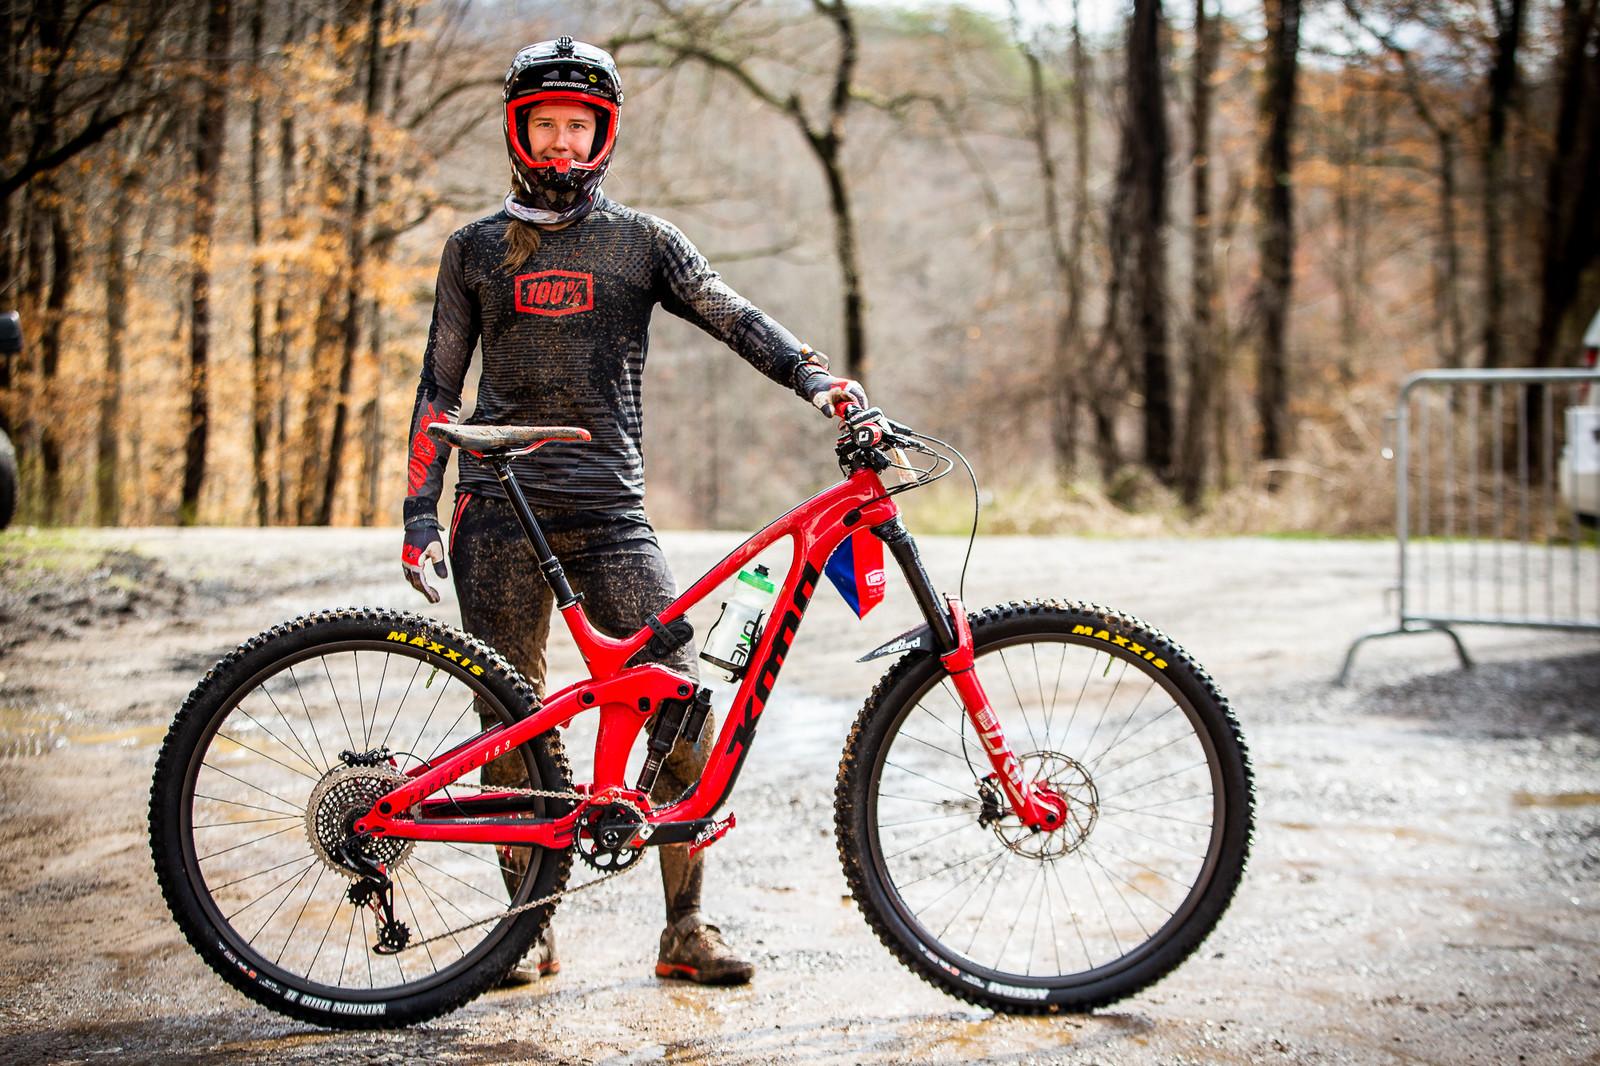 WINNING BIKE: Miranda Miller's Kona Process 153 from the Tennessee National - 2019 WINNING BIKES - Mountain Biking Pictures - Vital MTB